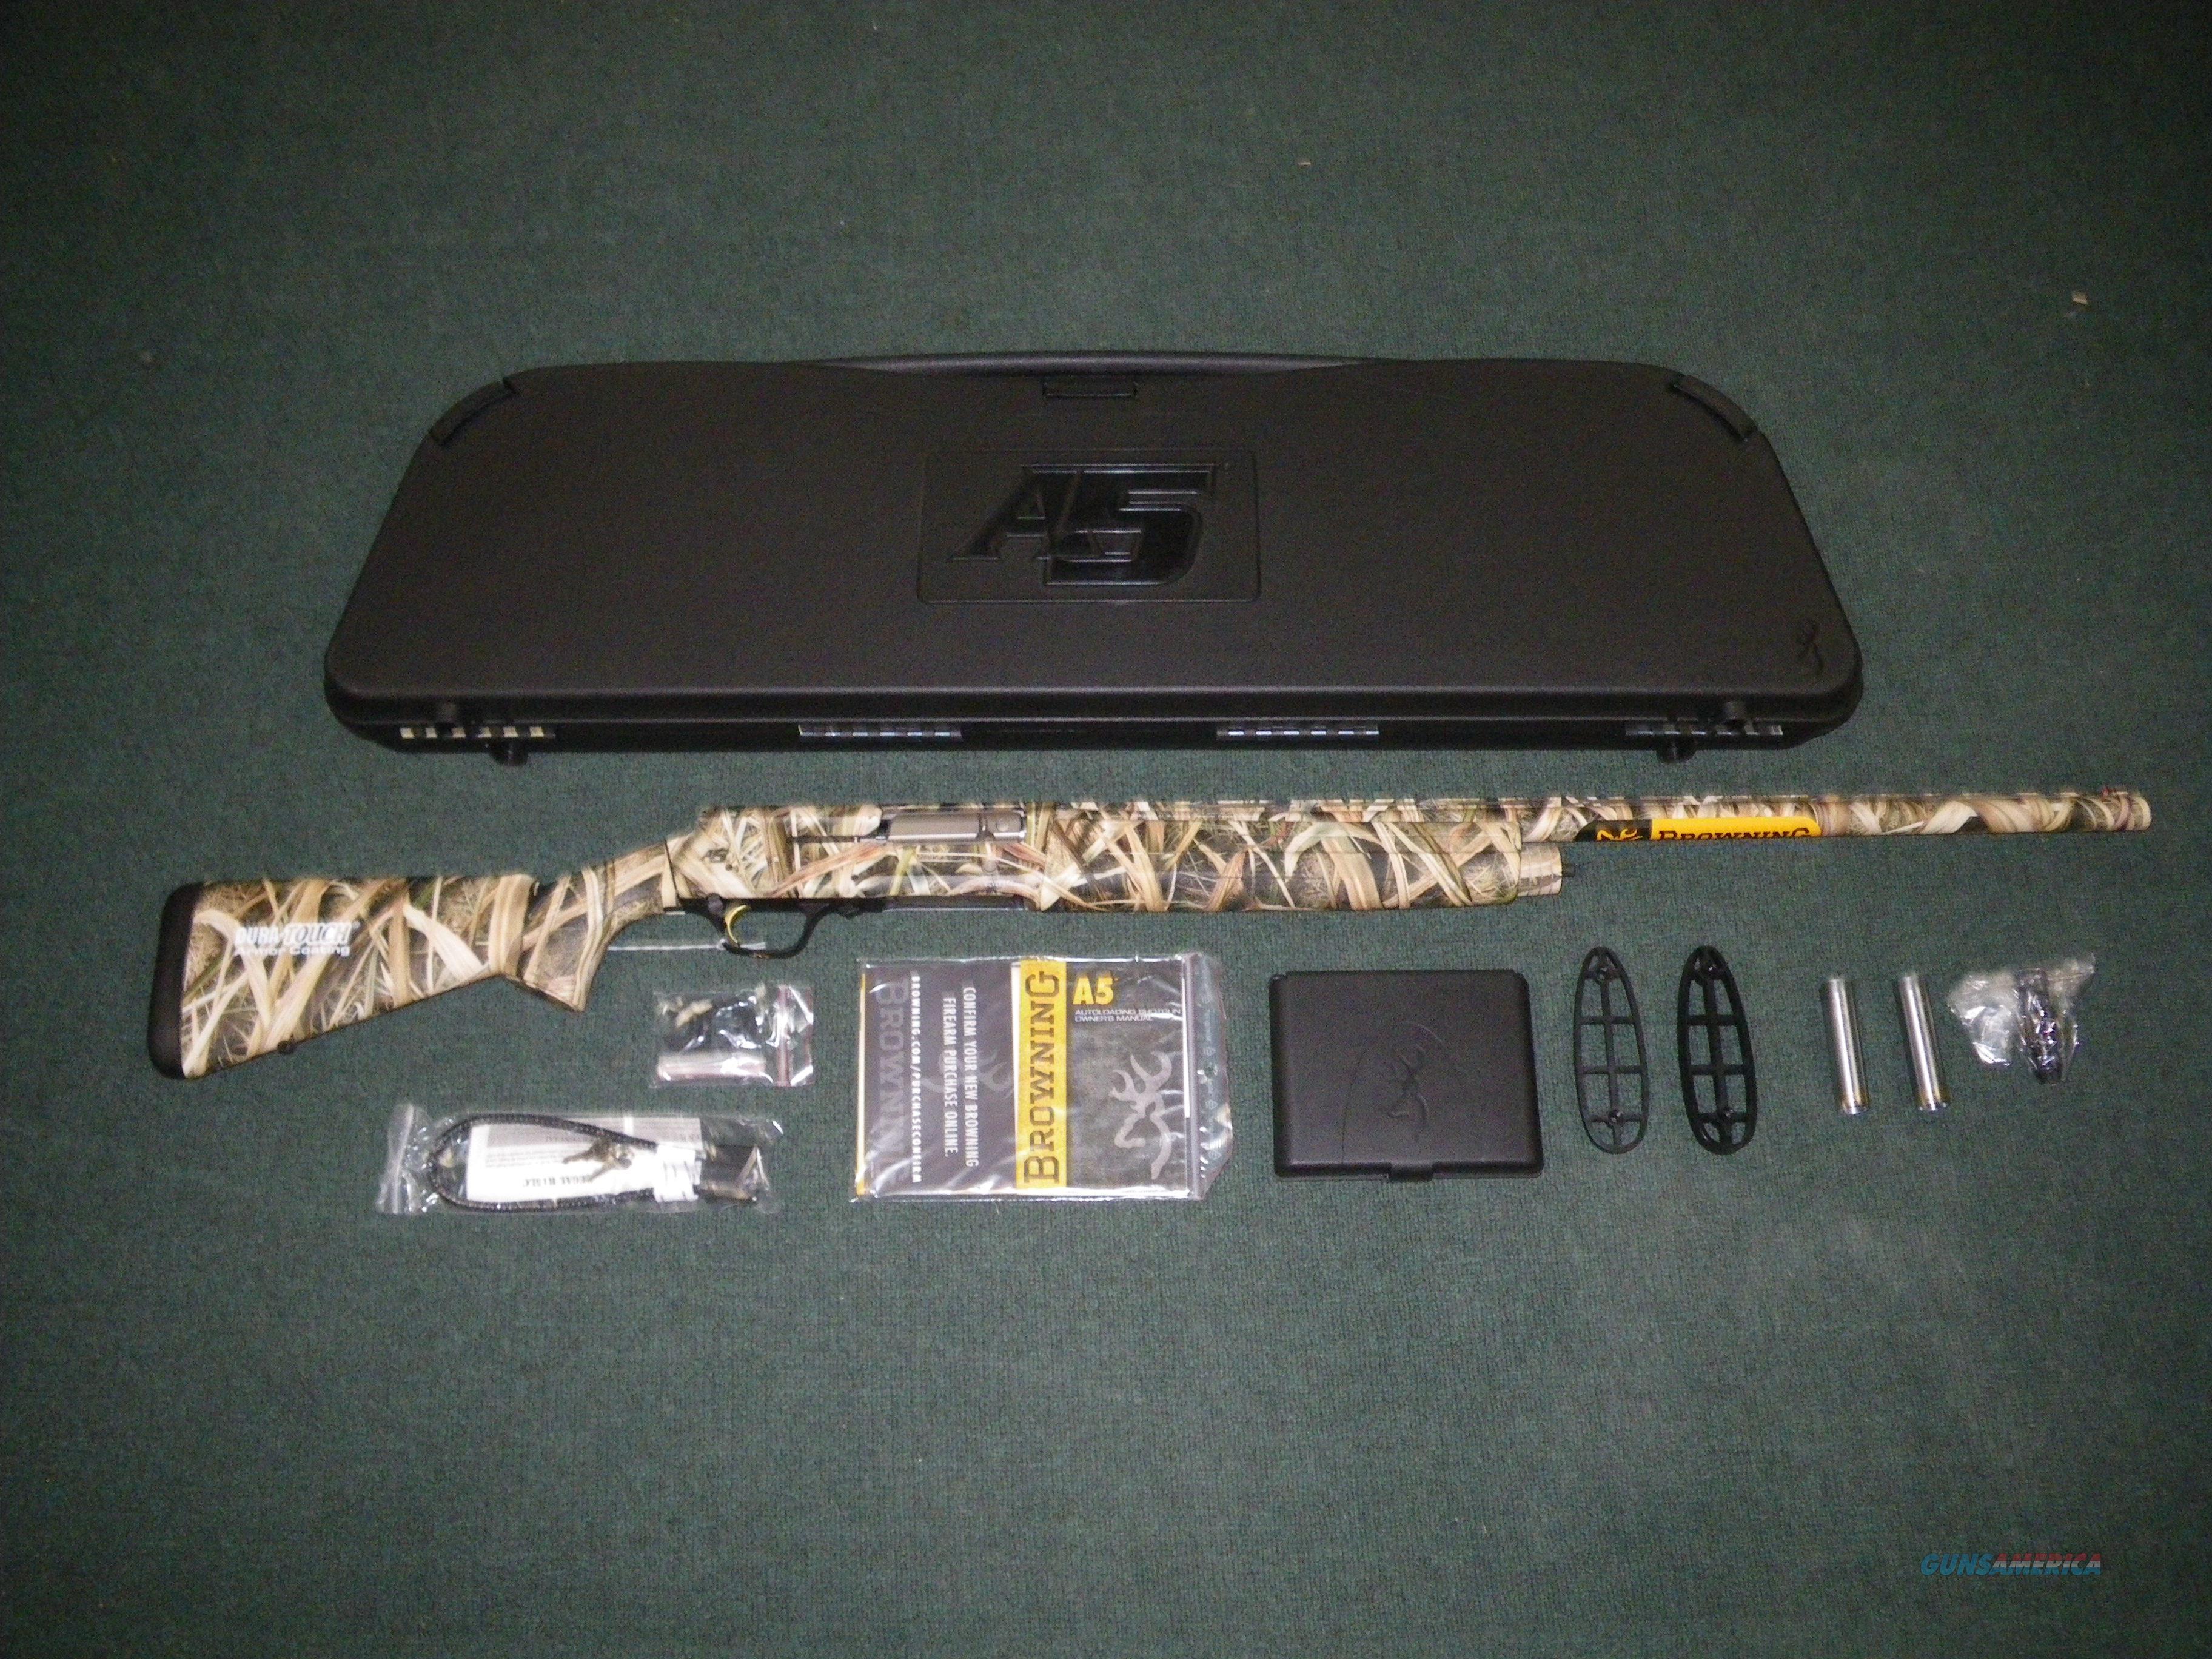 "Browning A5 Mossy Oak Shdw Grass 12ga 26"" NEW 3.5"" #0118182005  Guns > Shotguns > Browning Shotguns > Autoloaders > Hunting"